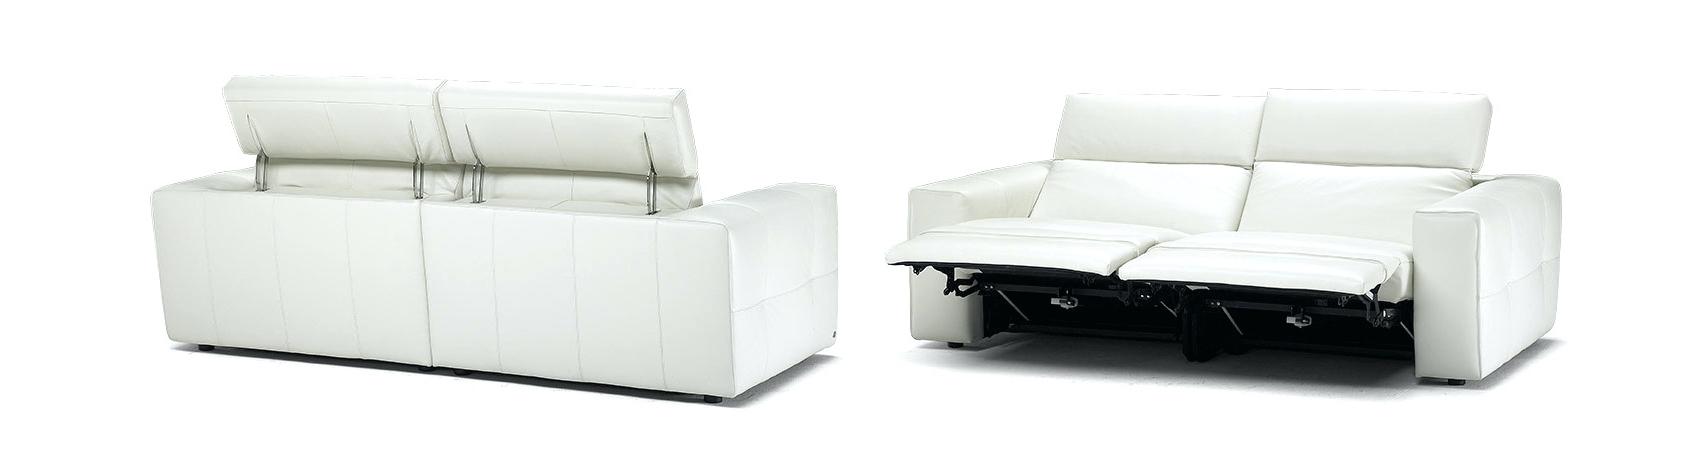 Most Recent Natuzzi Zeta Chaise Lounge Chairs Within Natuzzi Zeta Chaise Lounge Chairs • Lounge Chairs Ideas (View 2 of 15)